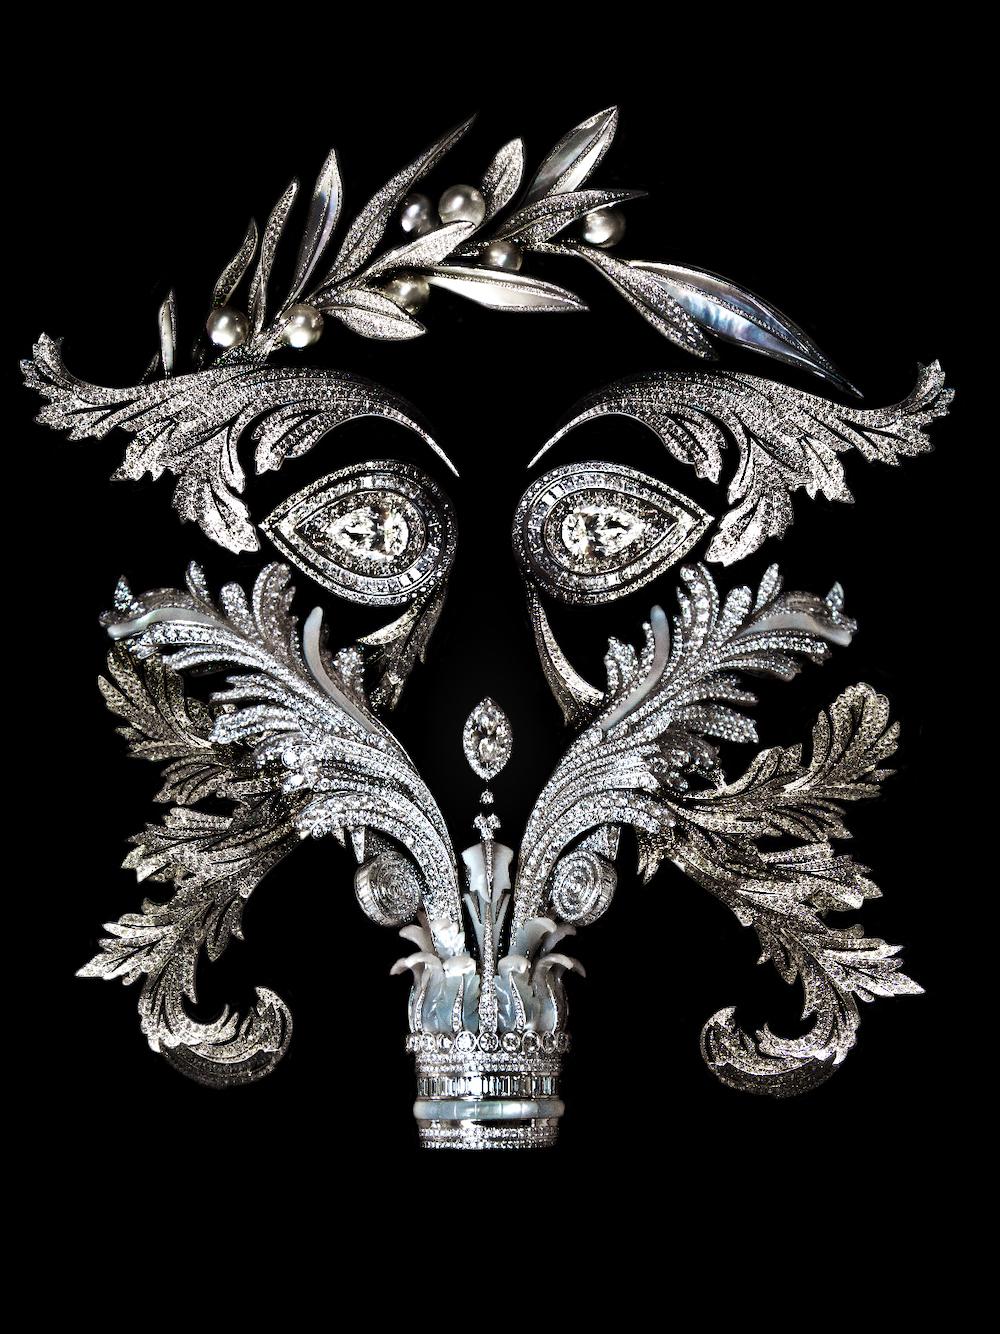 Under the precious masks